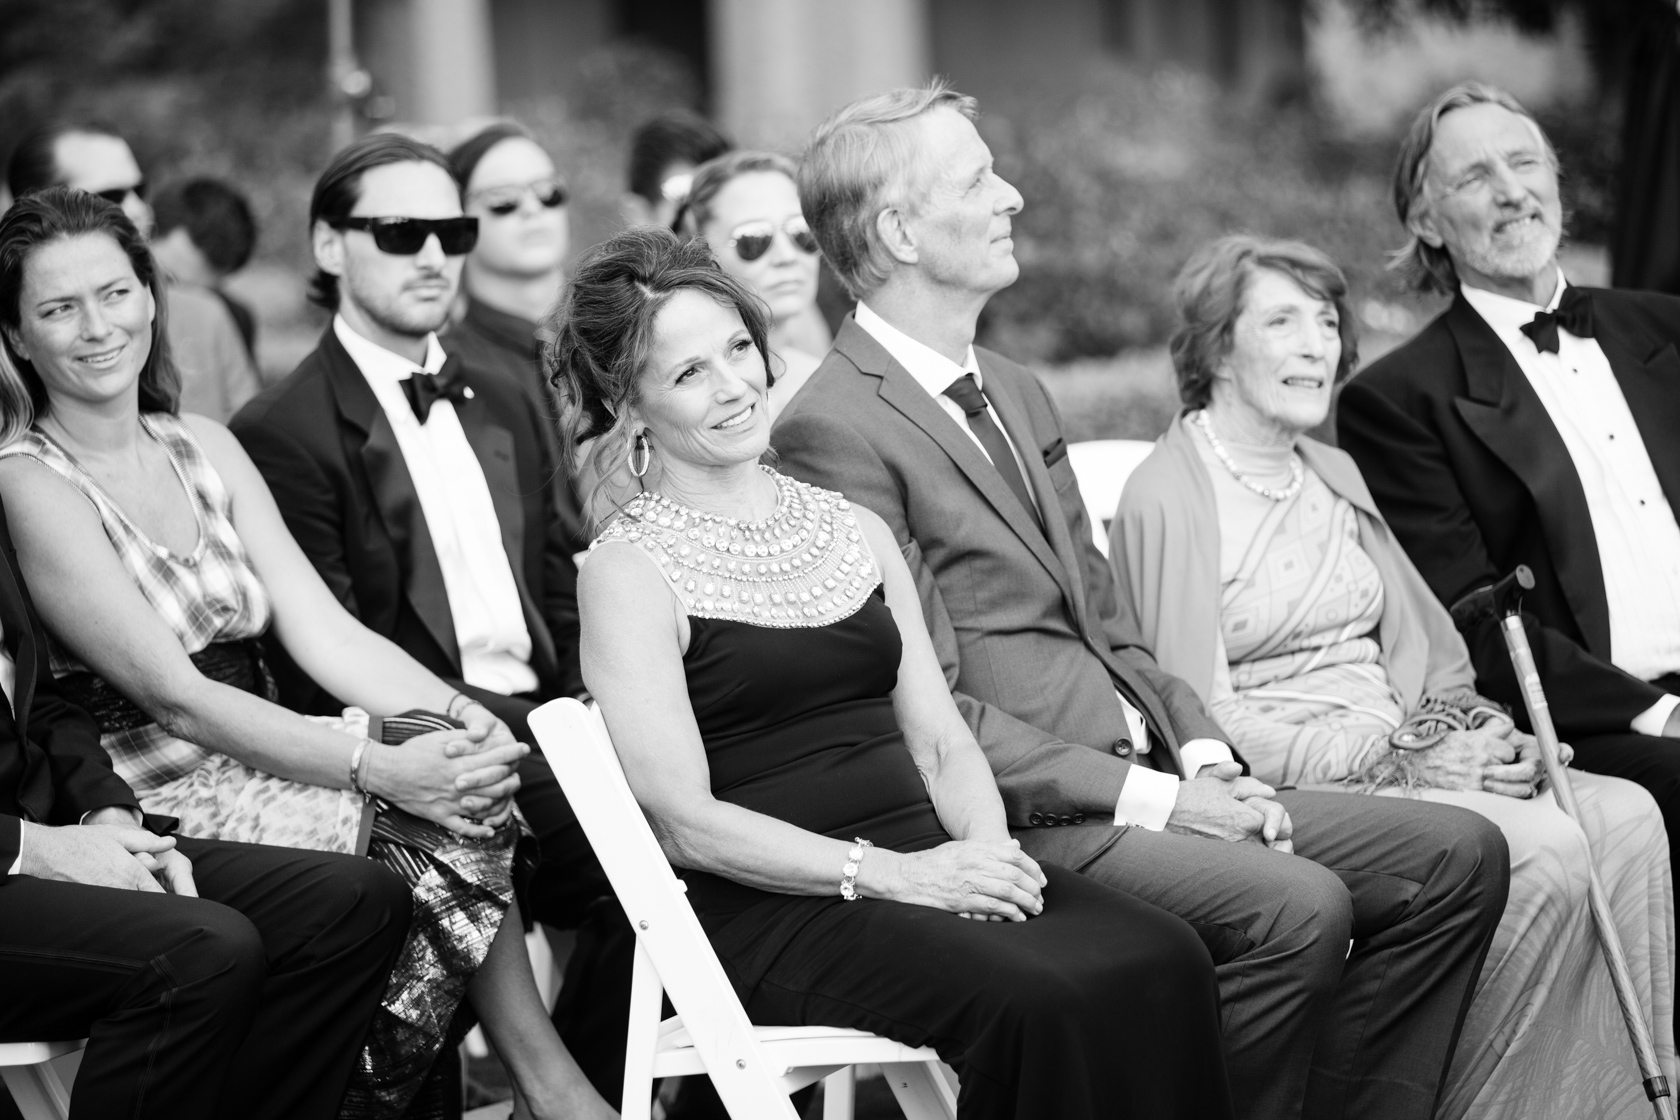 The_Lodge_at_Torrey_Pines_Wedding_052.jpg